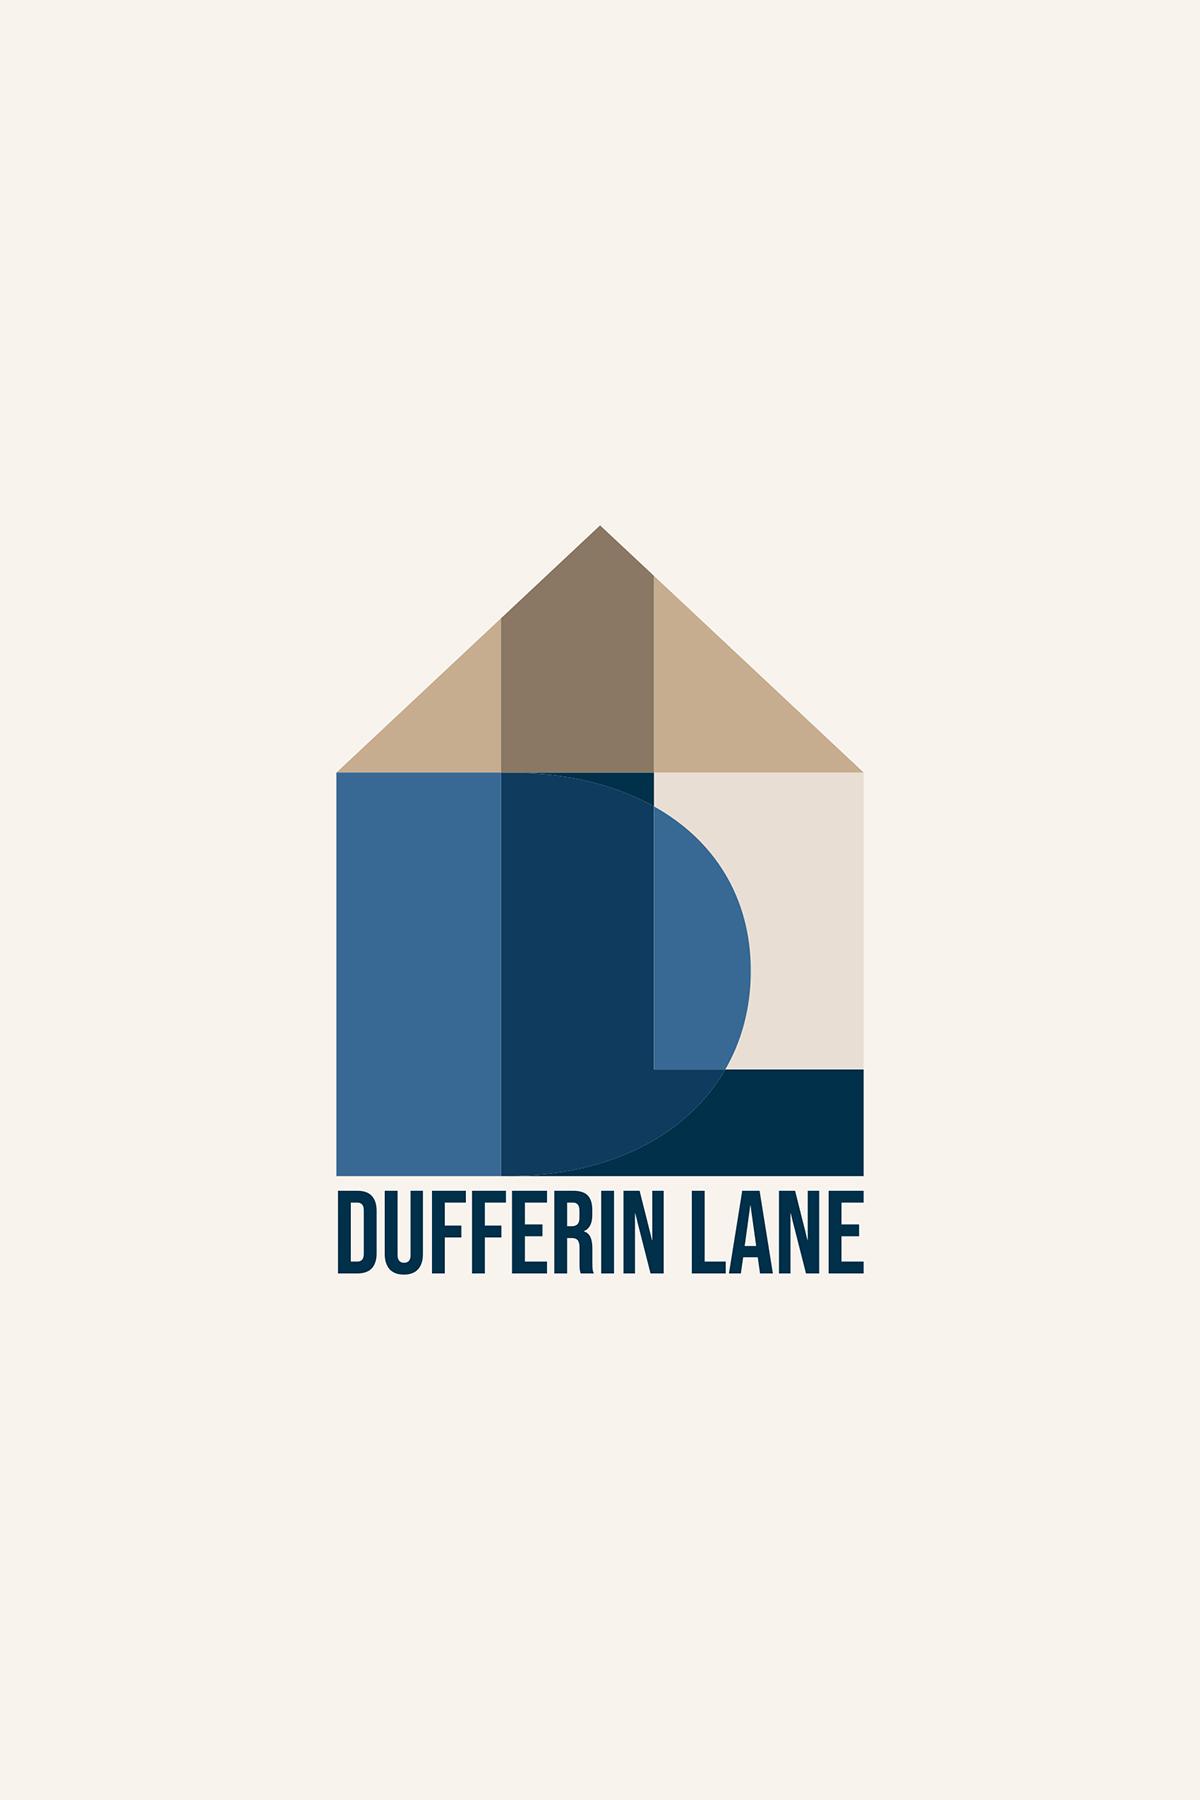 Dufferin Lane Logo - Creative Partner client